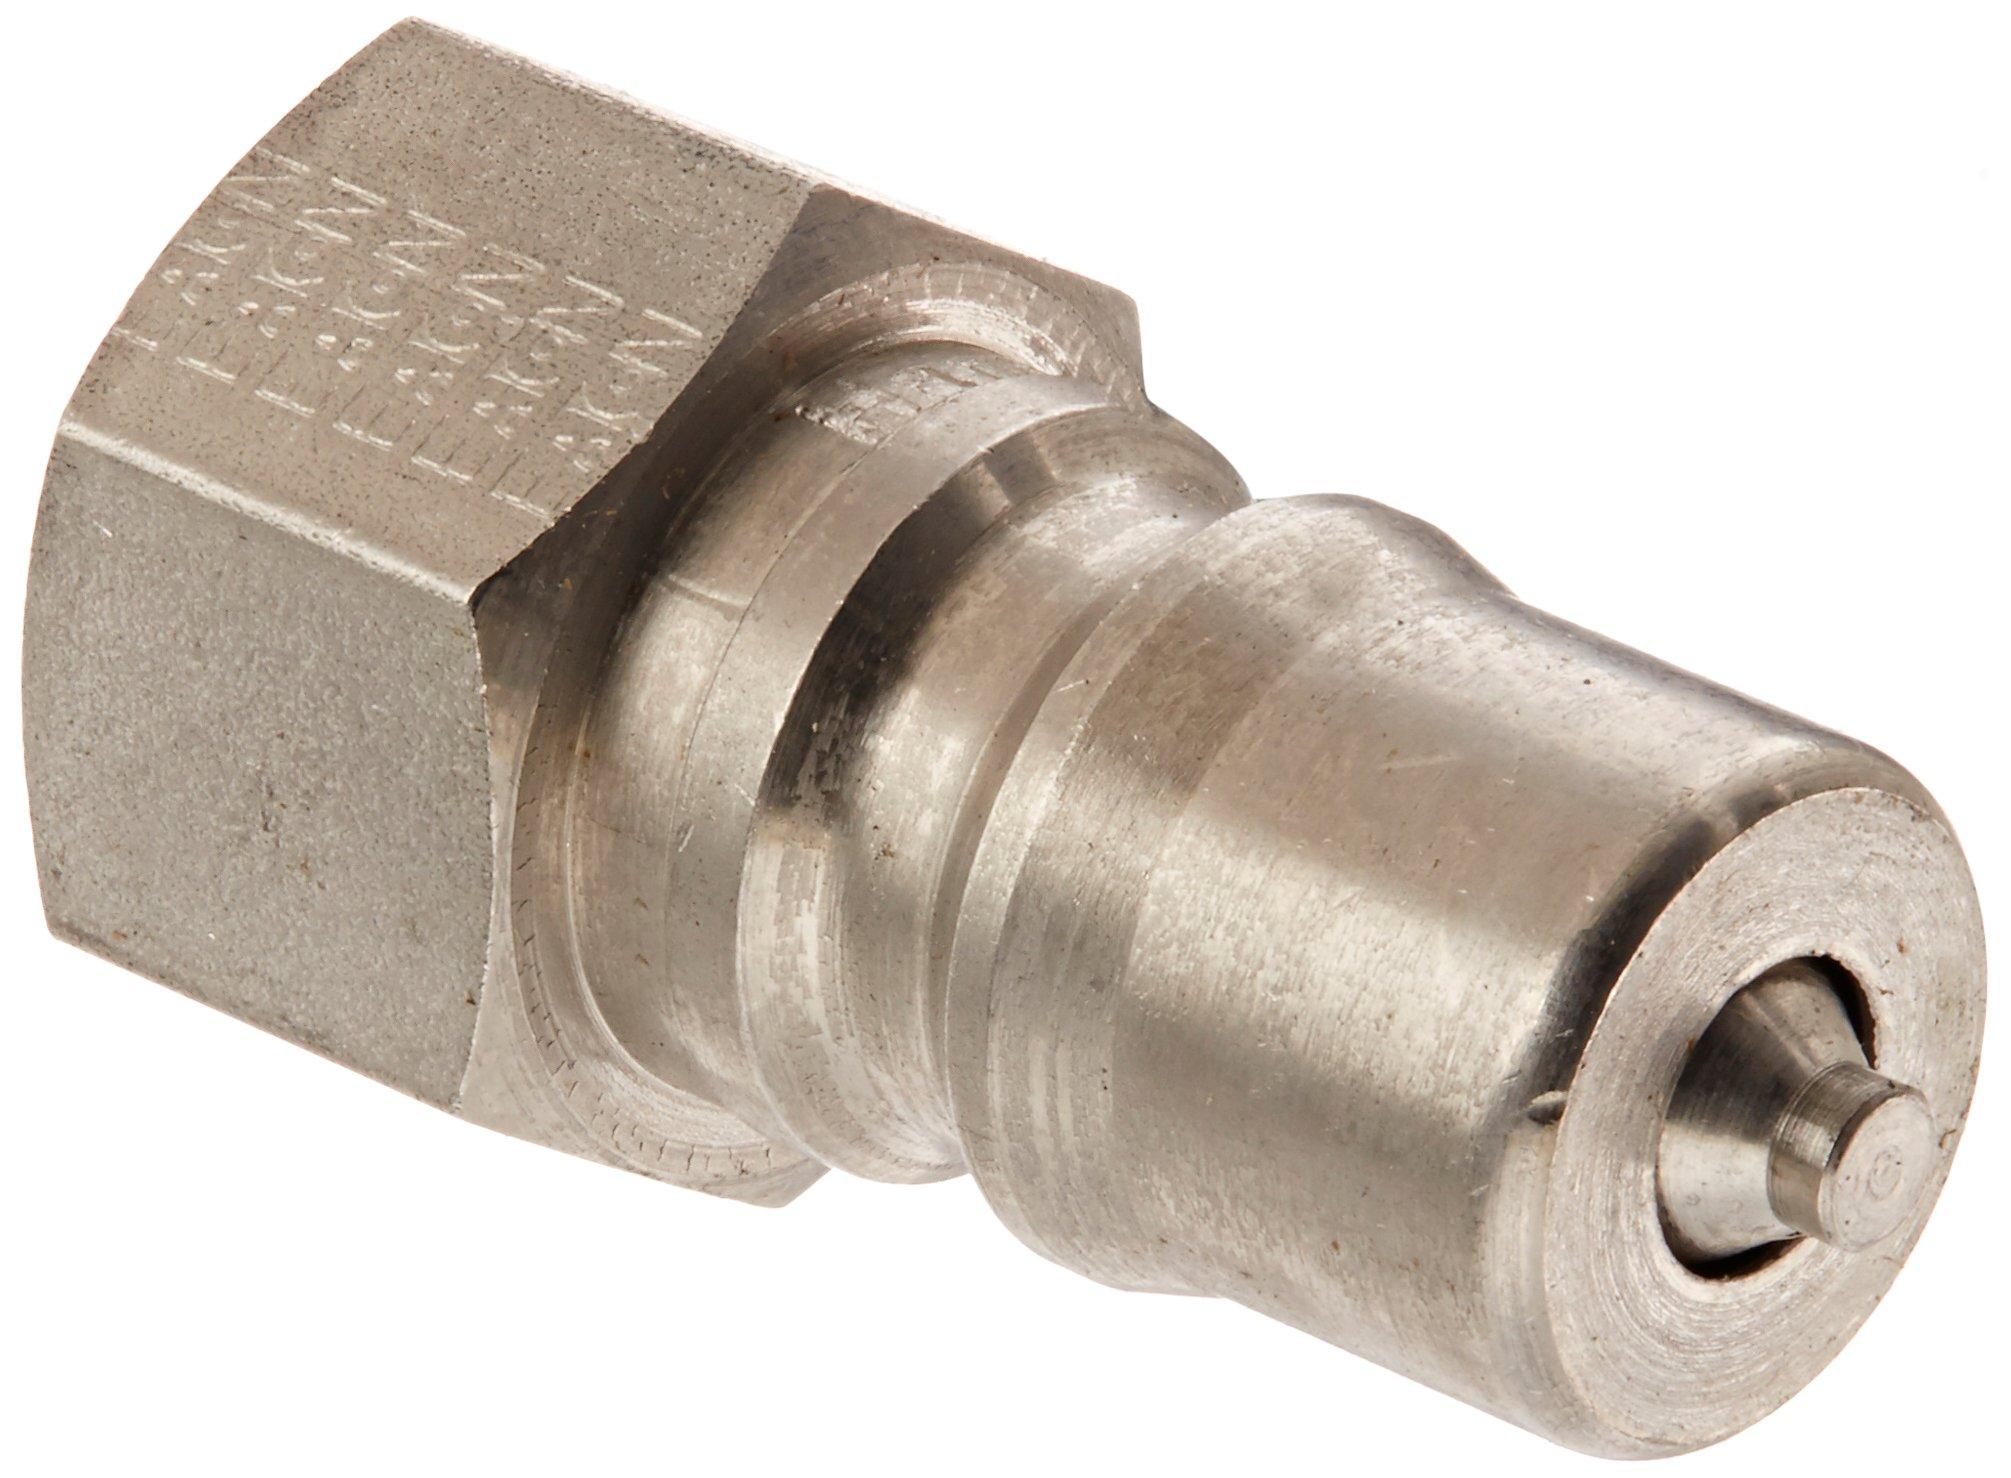 Eaton Hansen LL2K16 Stainless Steel 303 ISO-B Interchange Hydraulic Fitting, Plug with Valve, 1/4''-18 NPTF Female, 1/4'' Body